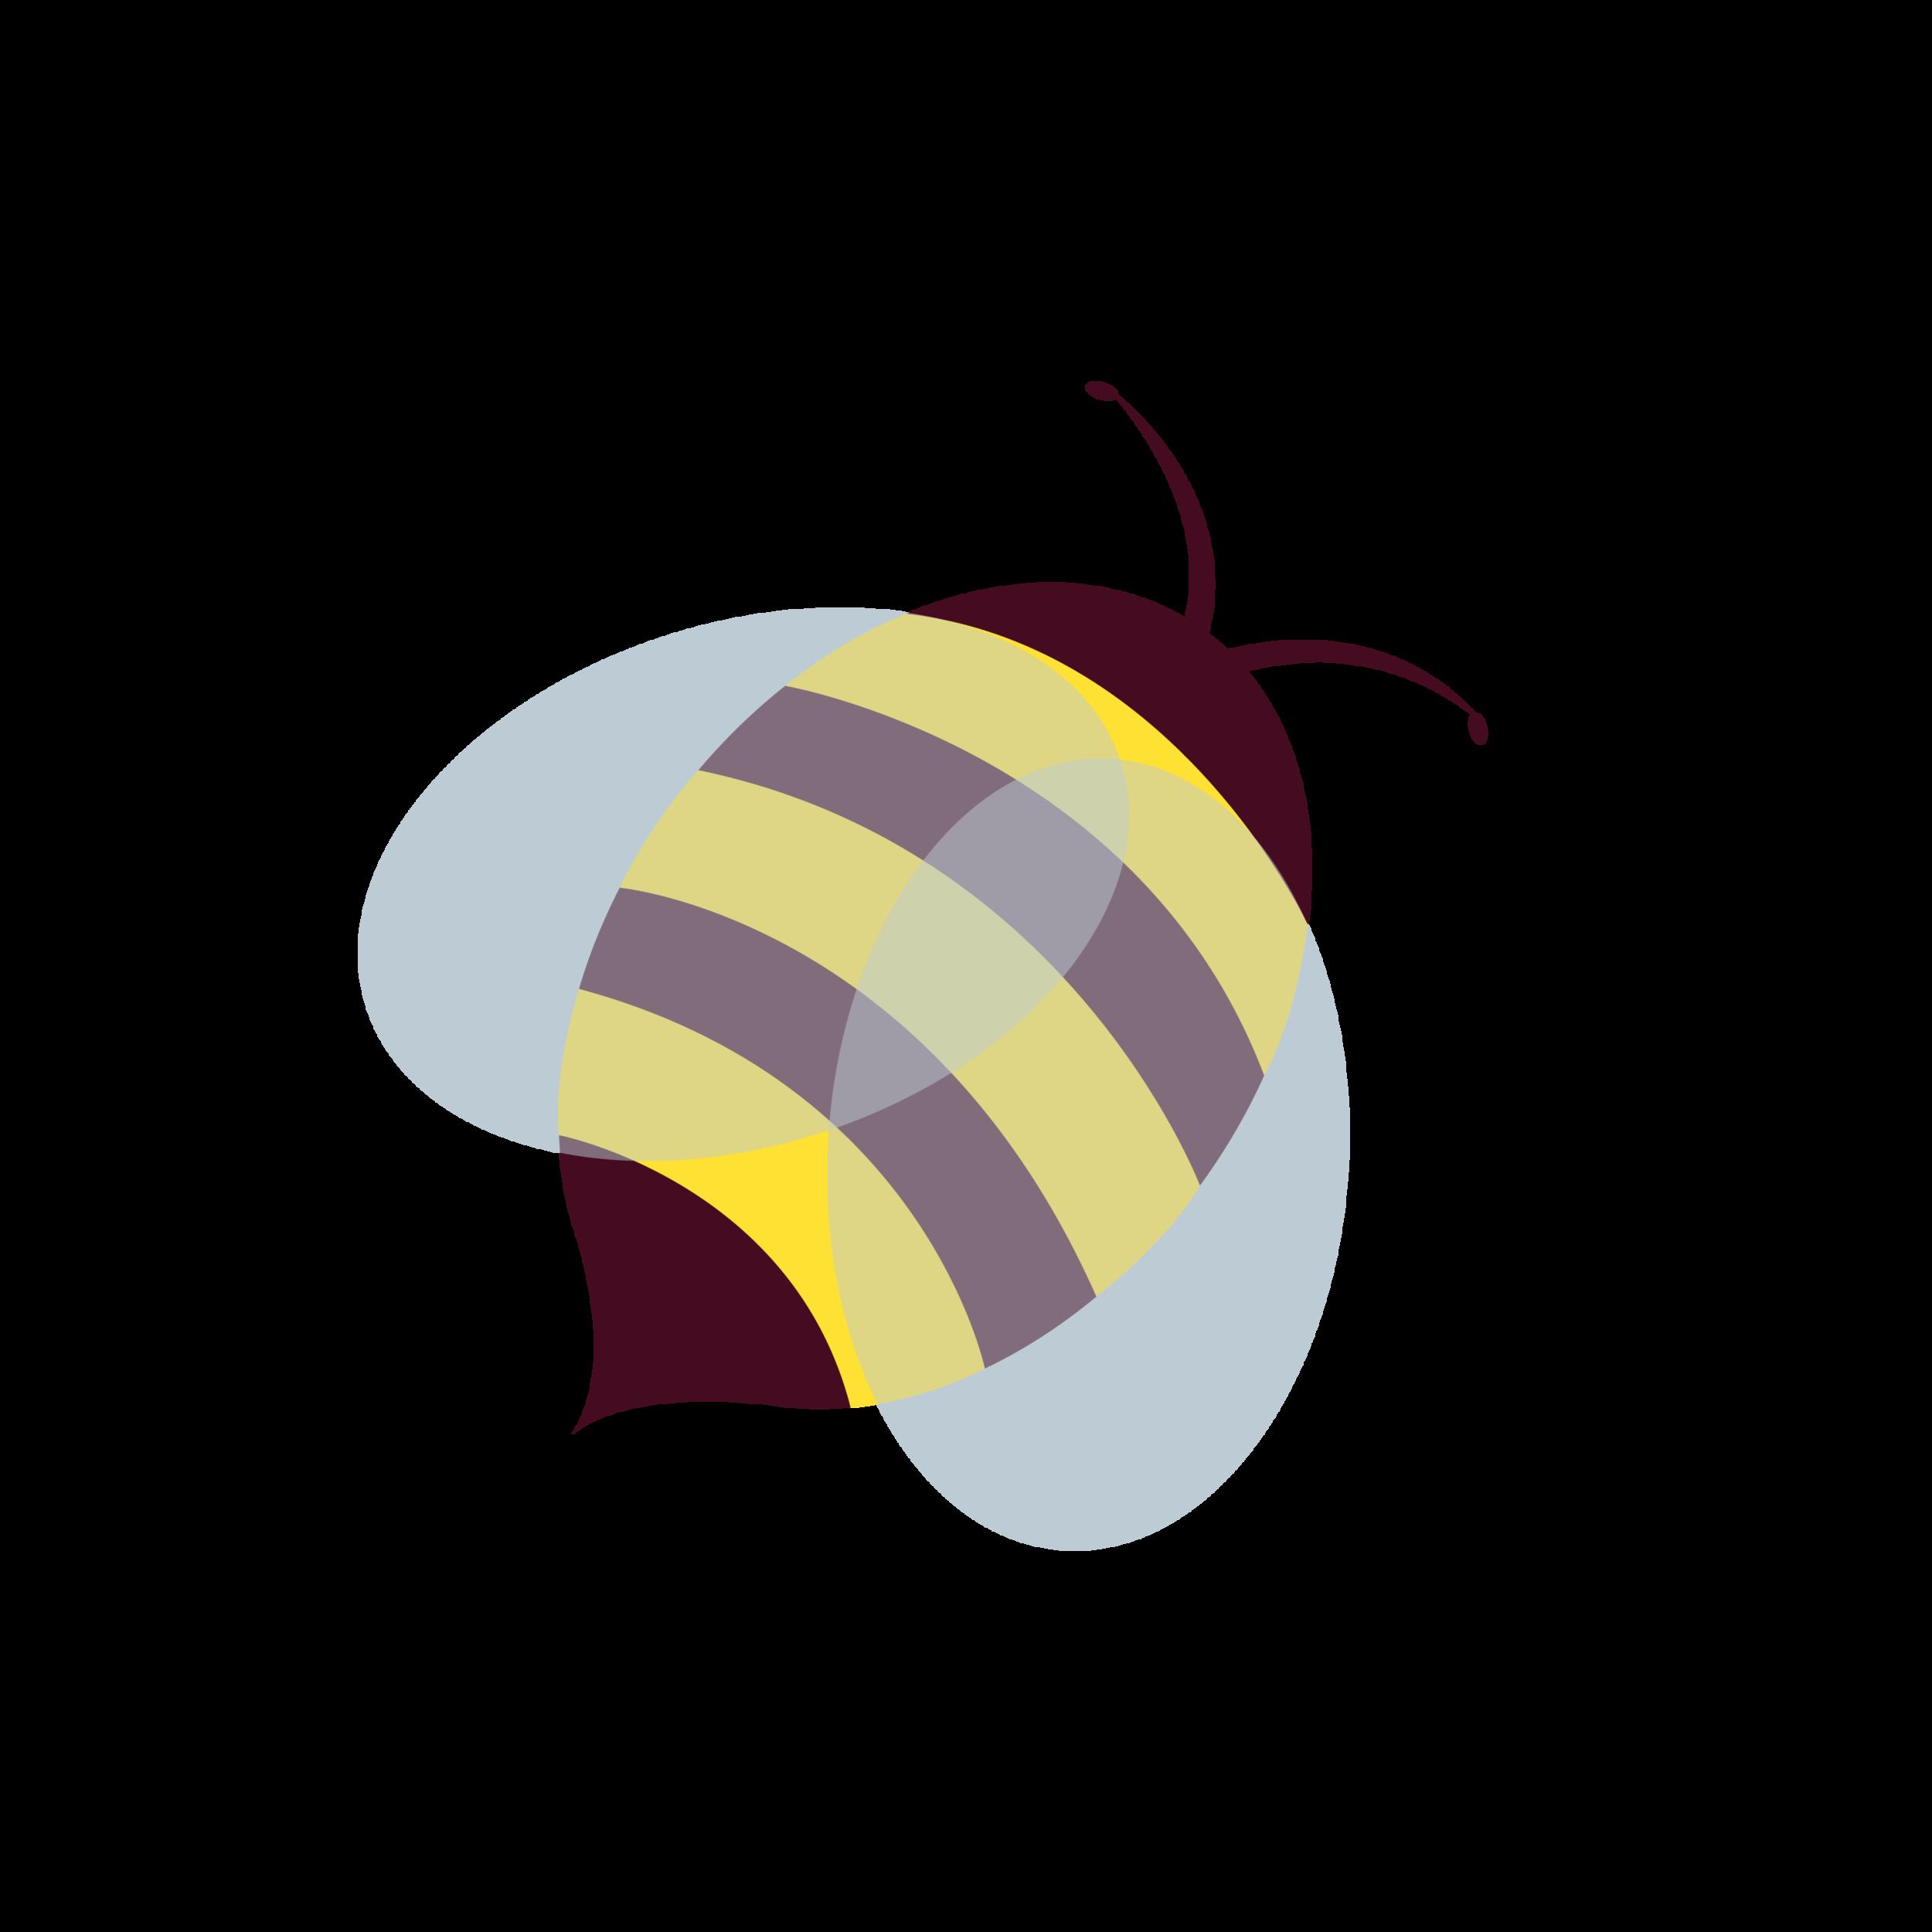 bee3_1.png